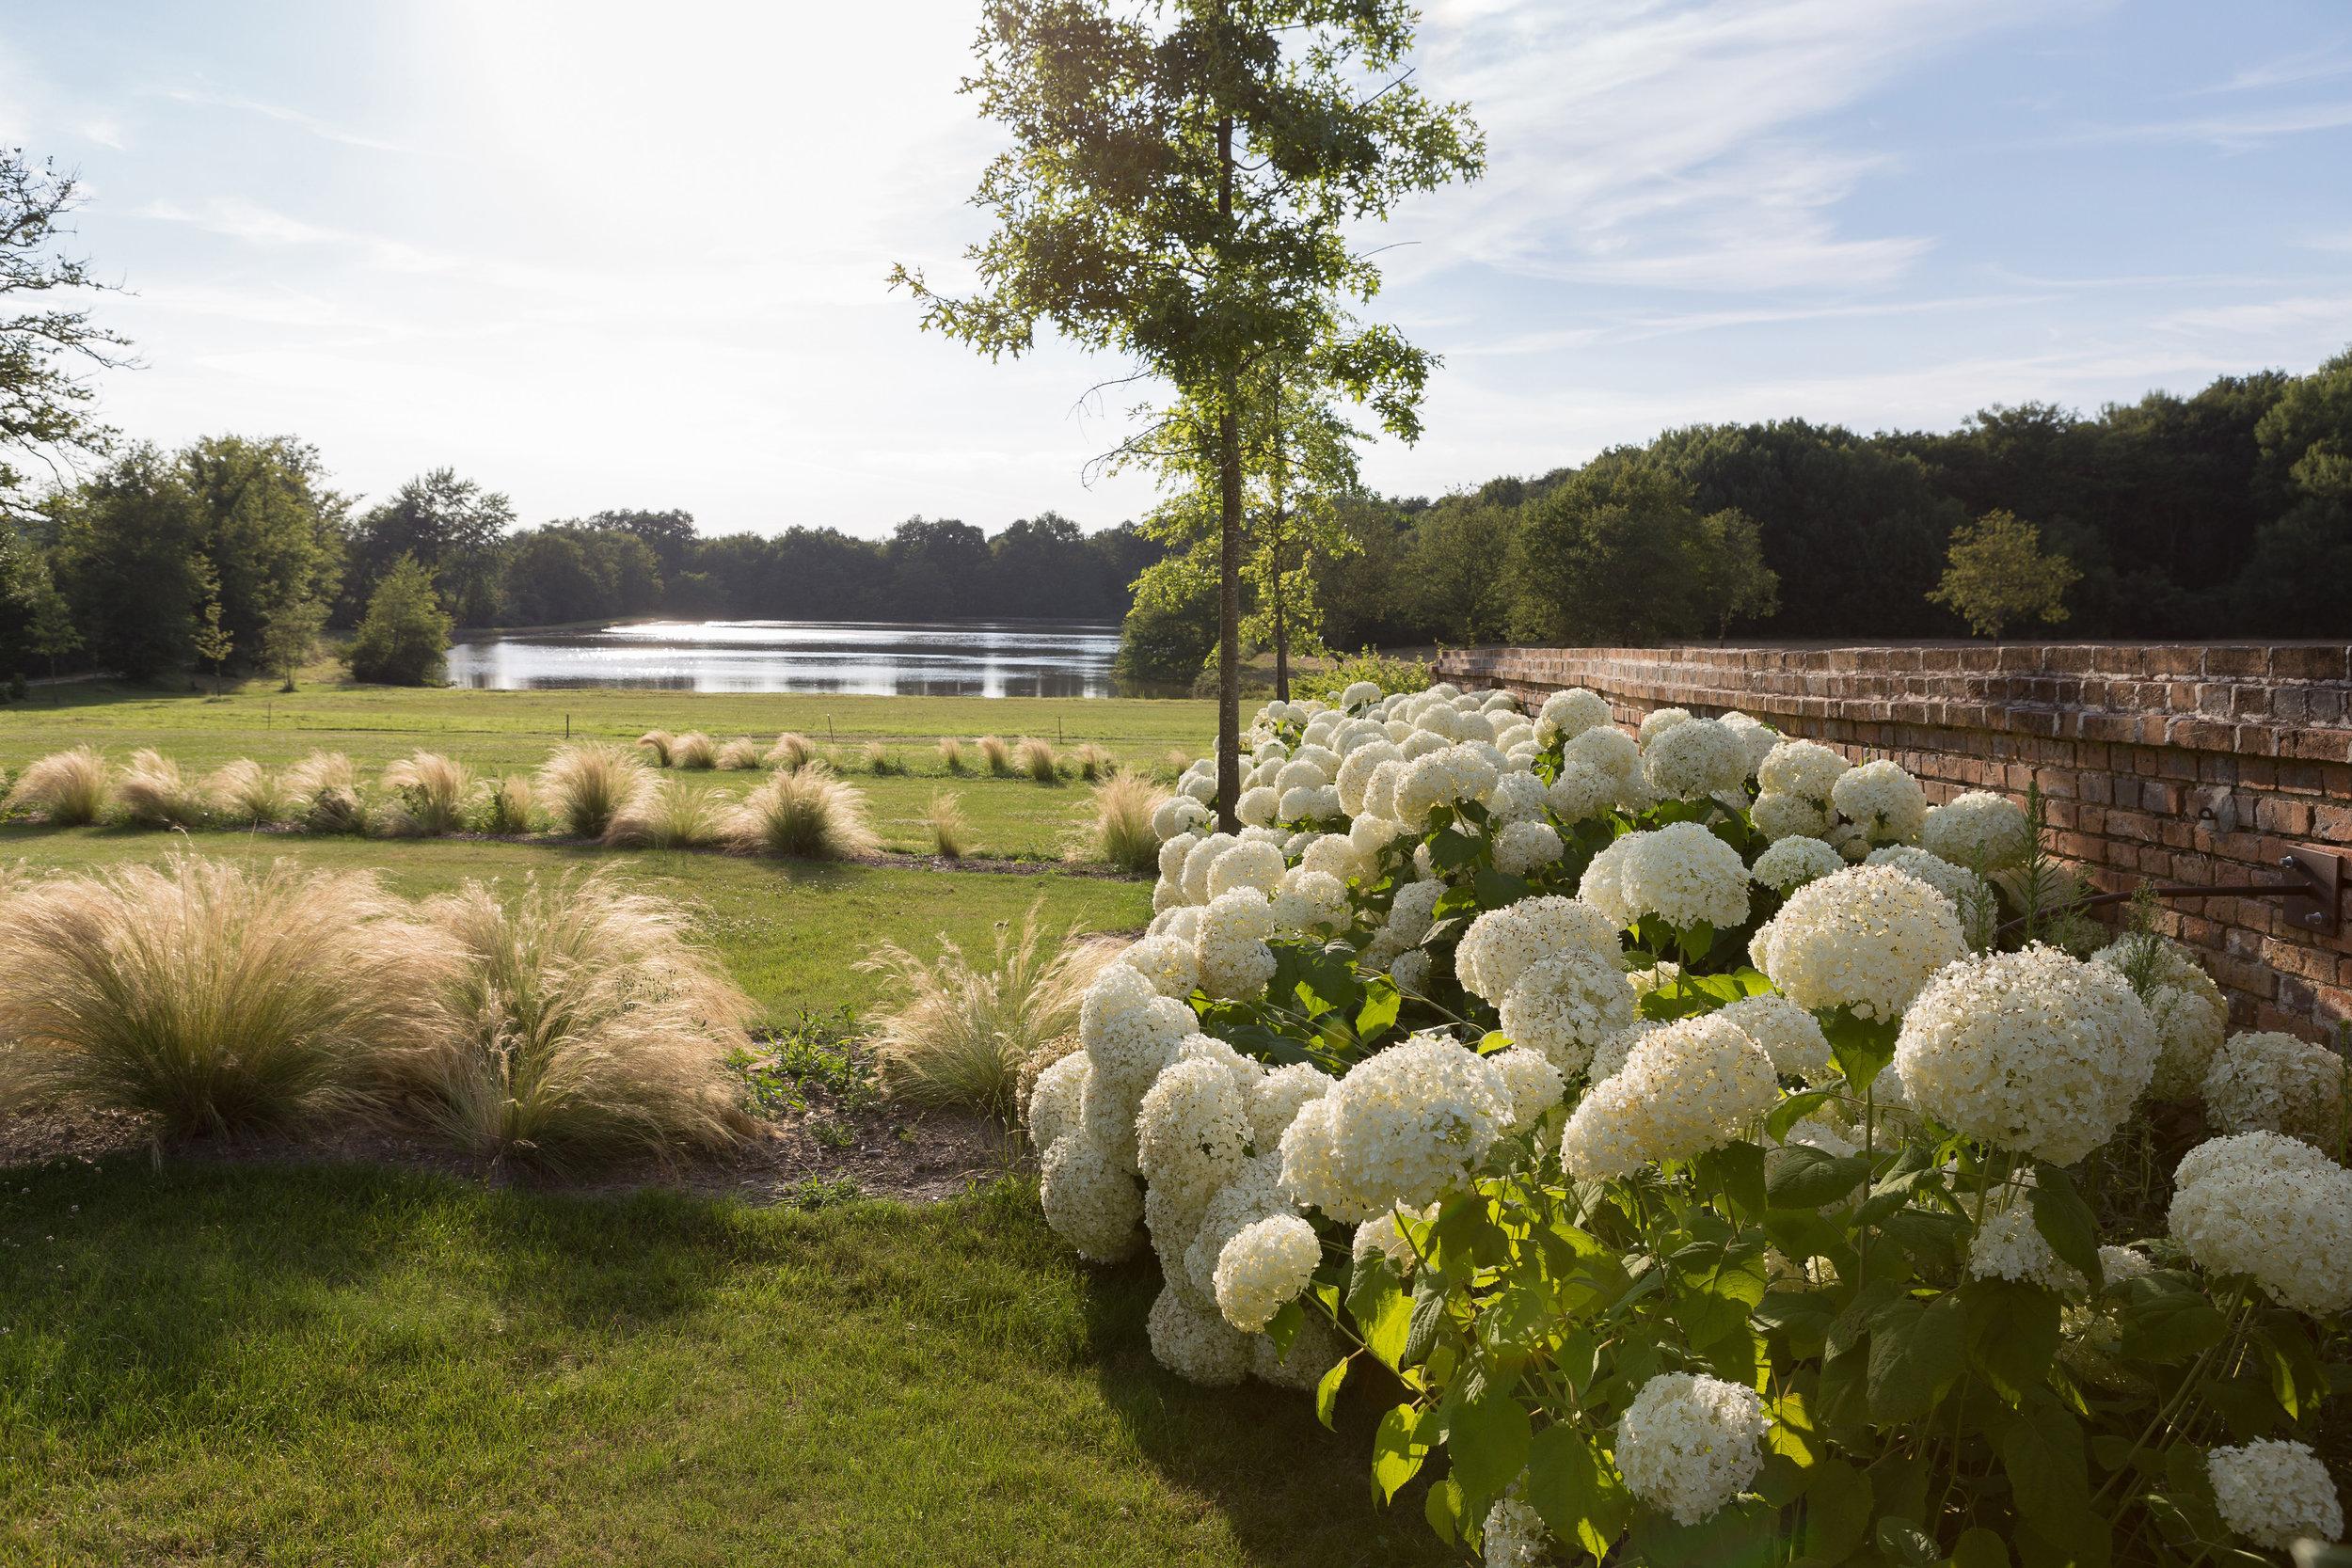 jardin_privé_vouzon_sologne_terrasses_jardins_outdoor_design_christophe_gautrand_paysagiste_8.jpg